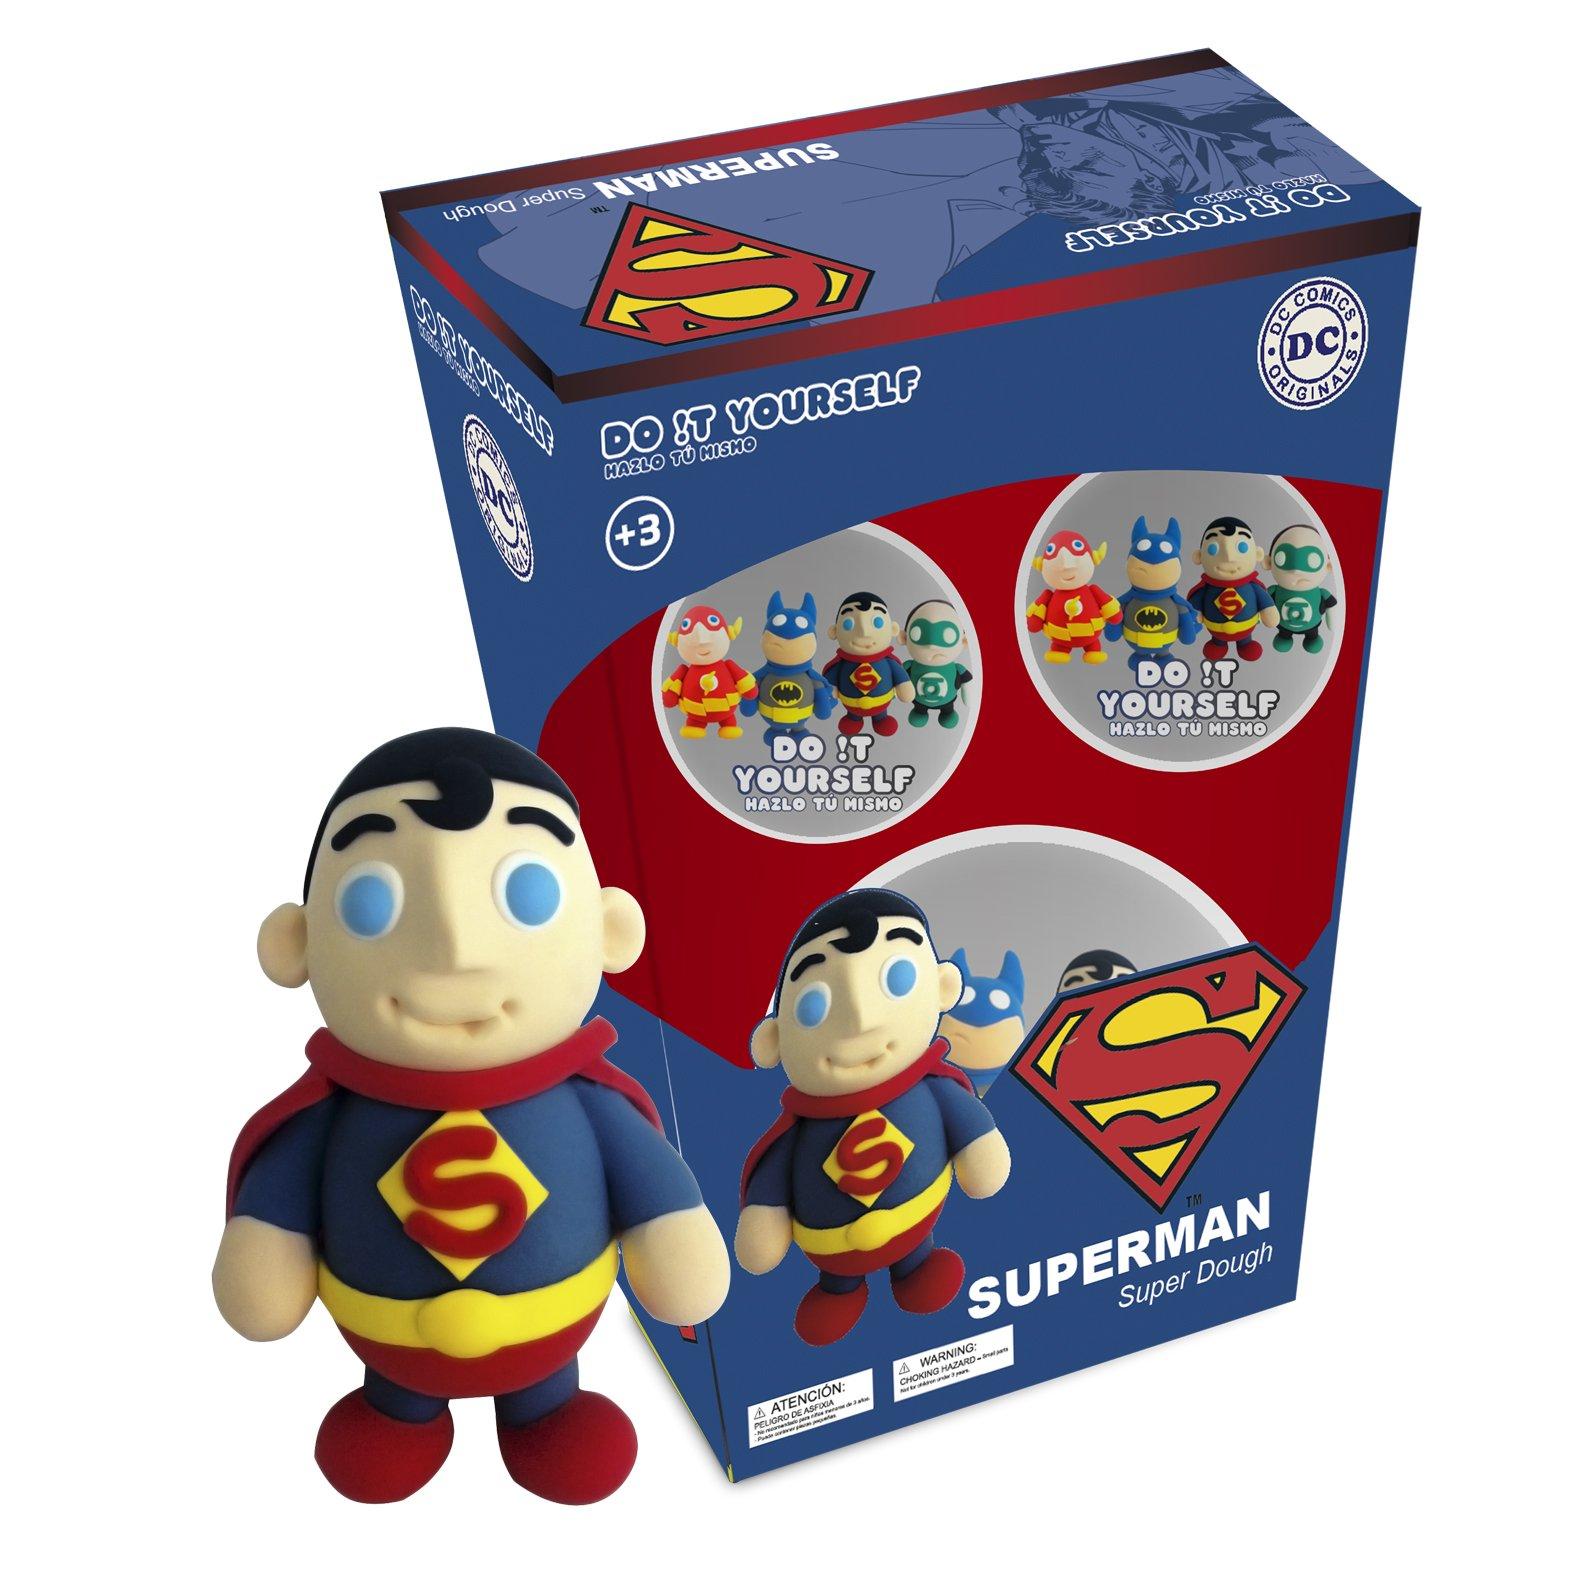 Superman Super Dough Do It Yourself Modeling Set by Superman